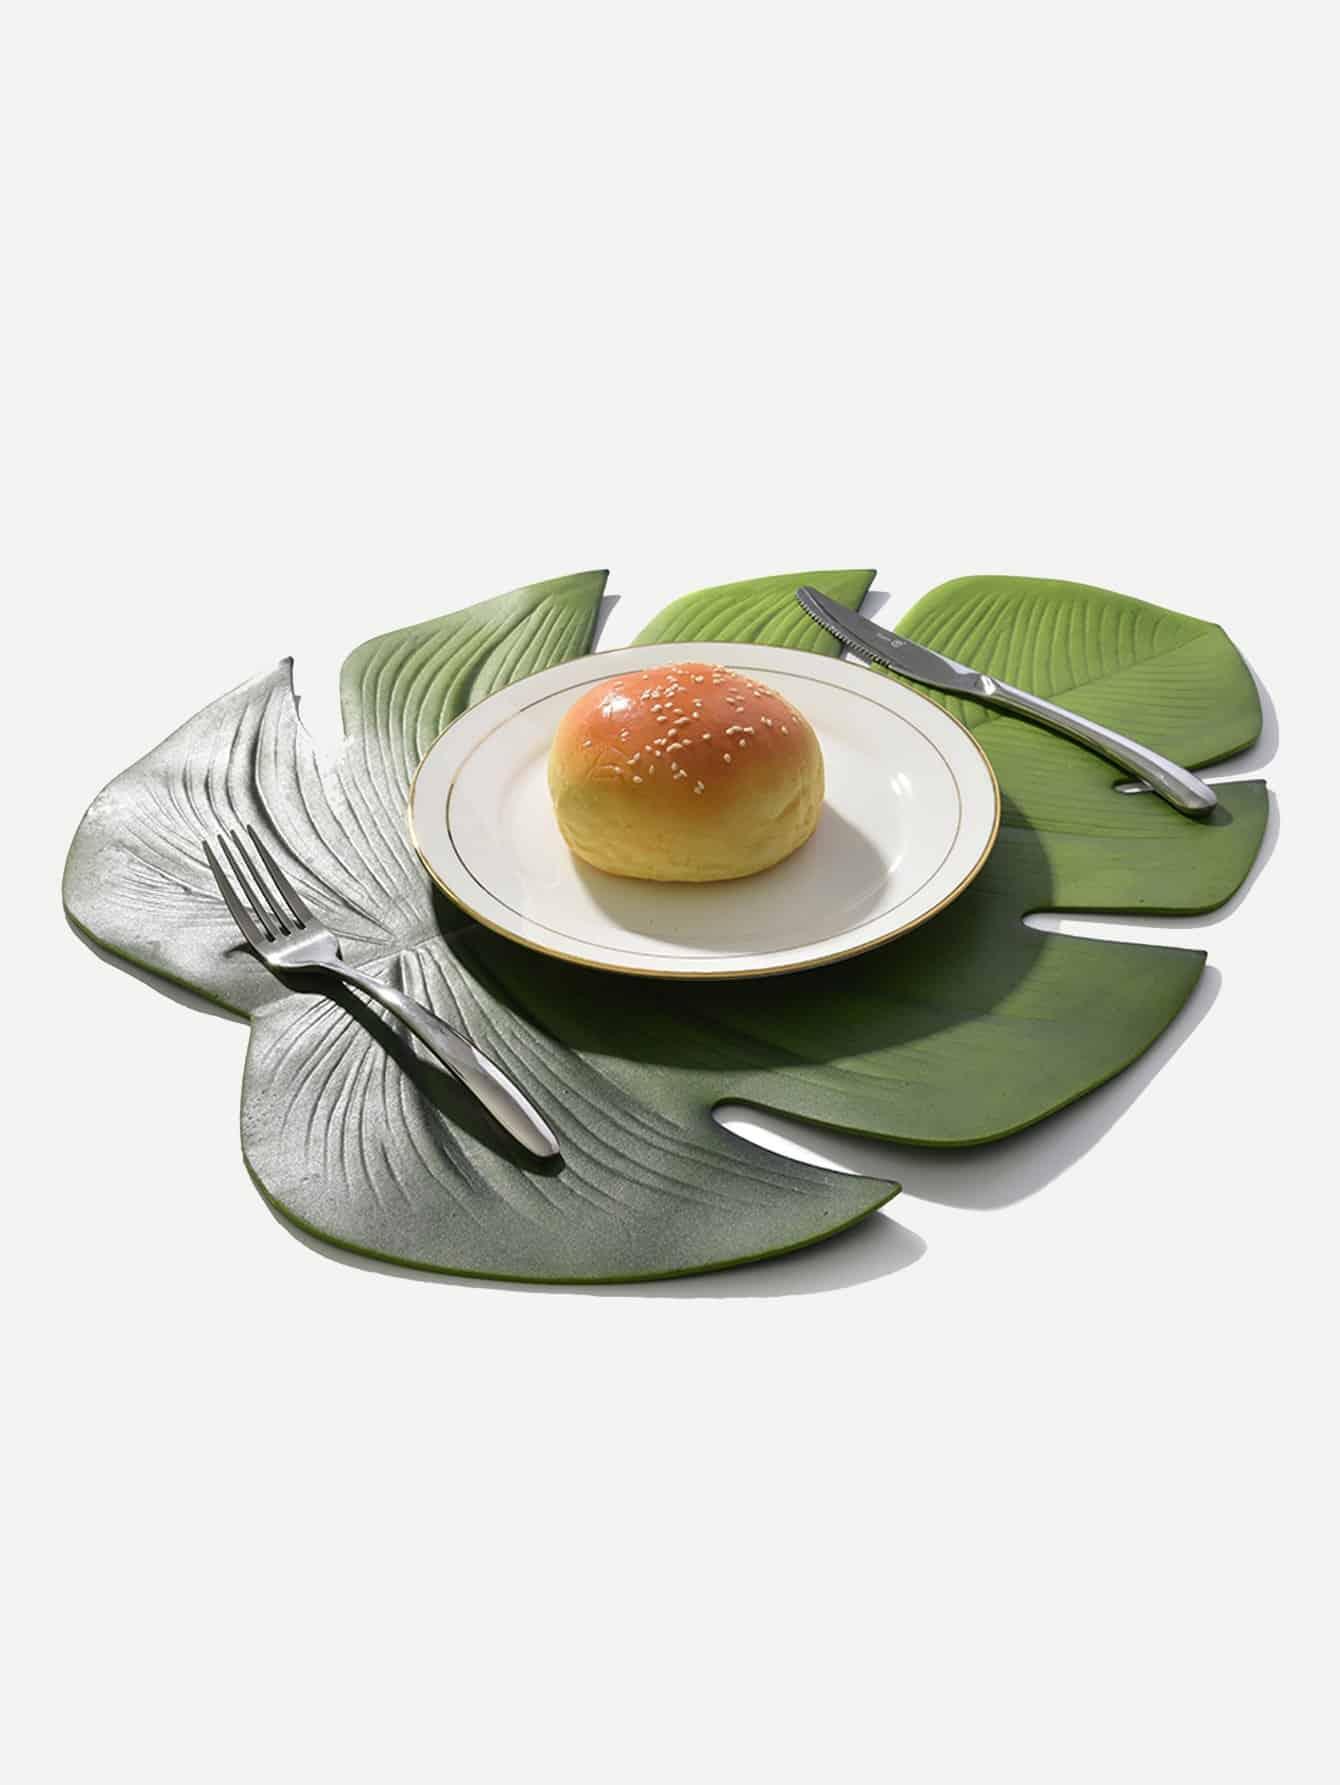 Купить Подстилка для стола в форме пальмового листа 1 шт, null, SheIn